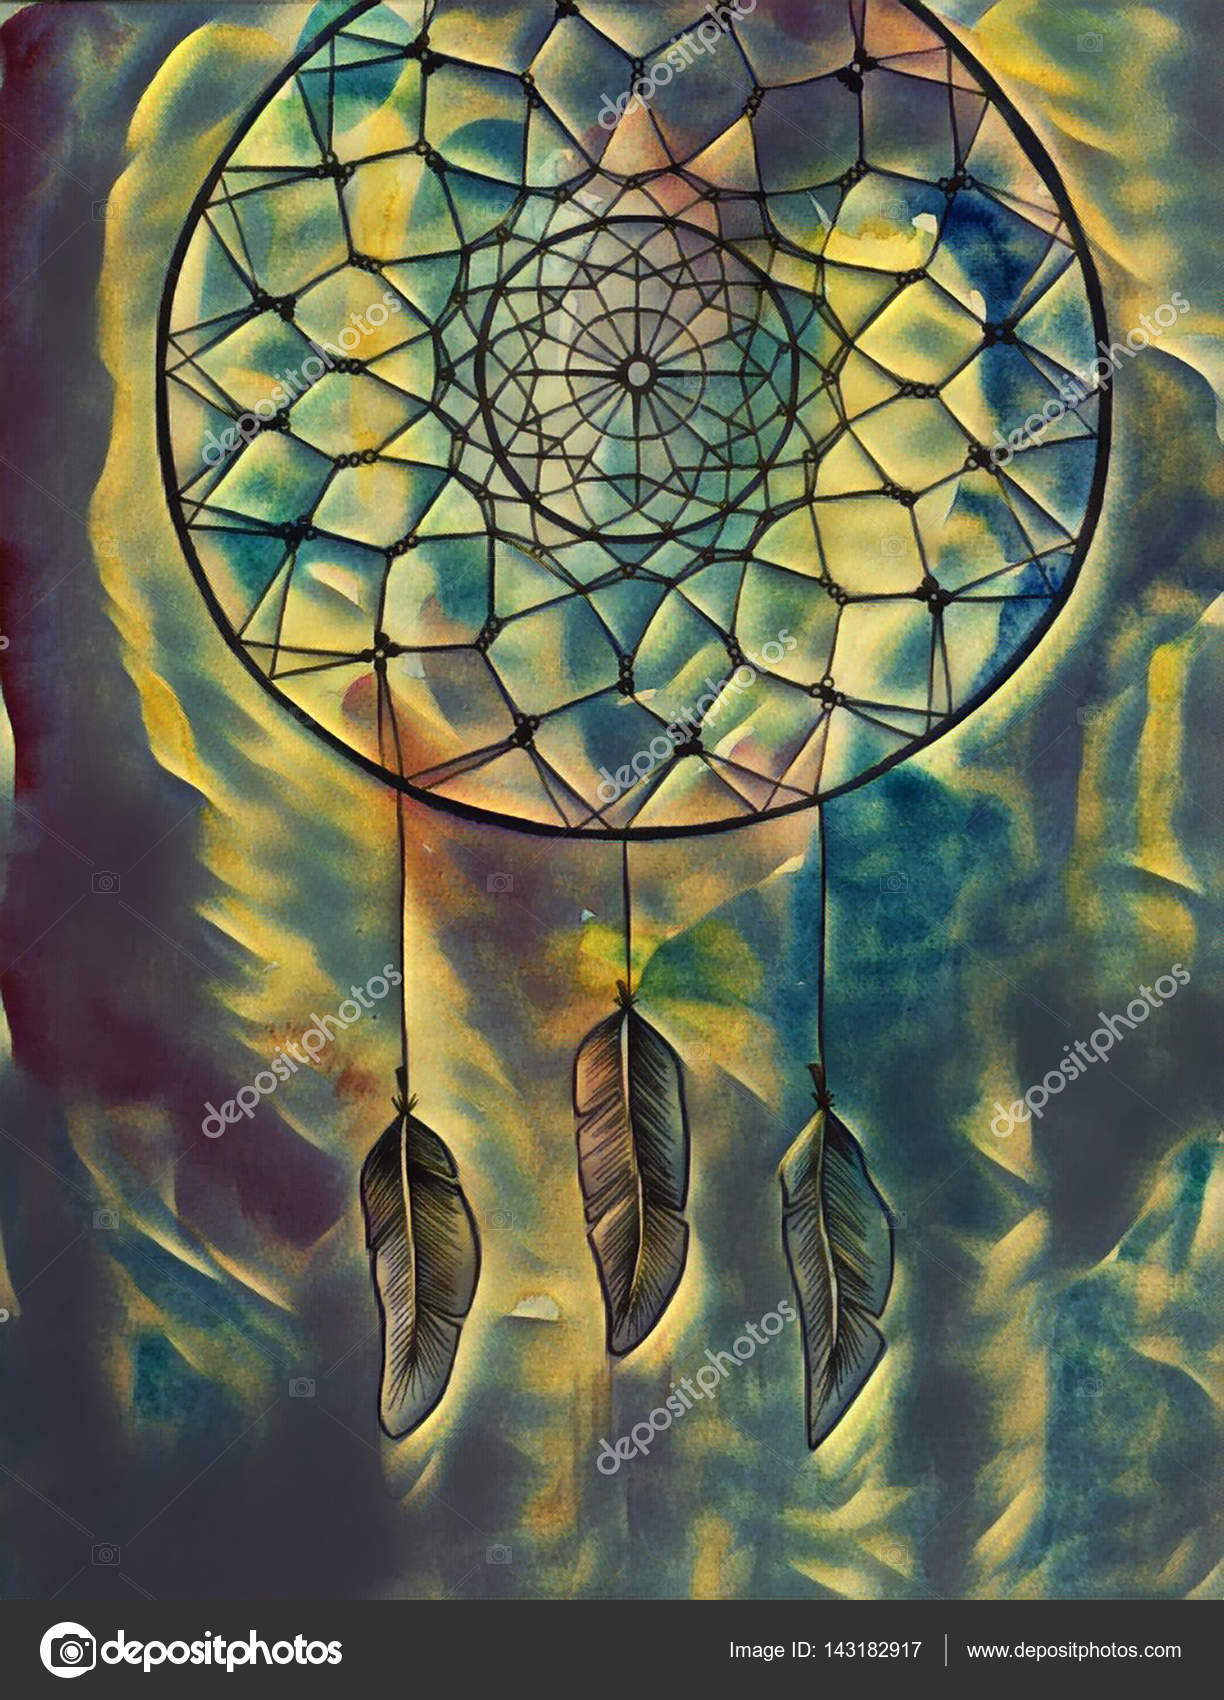 Dream Catcher Abstract Painting Dreamcatcher Digital